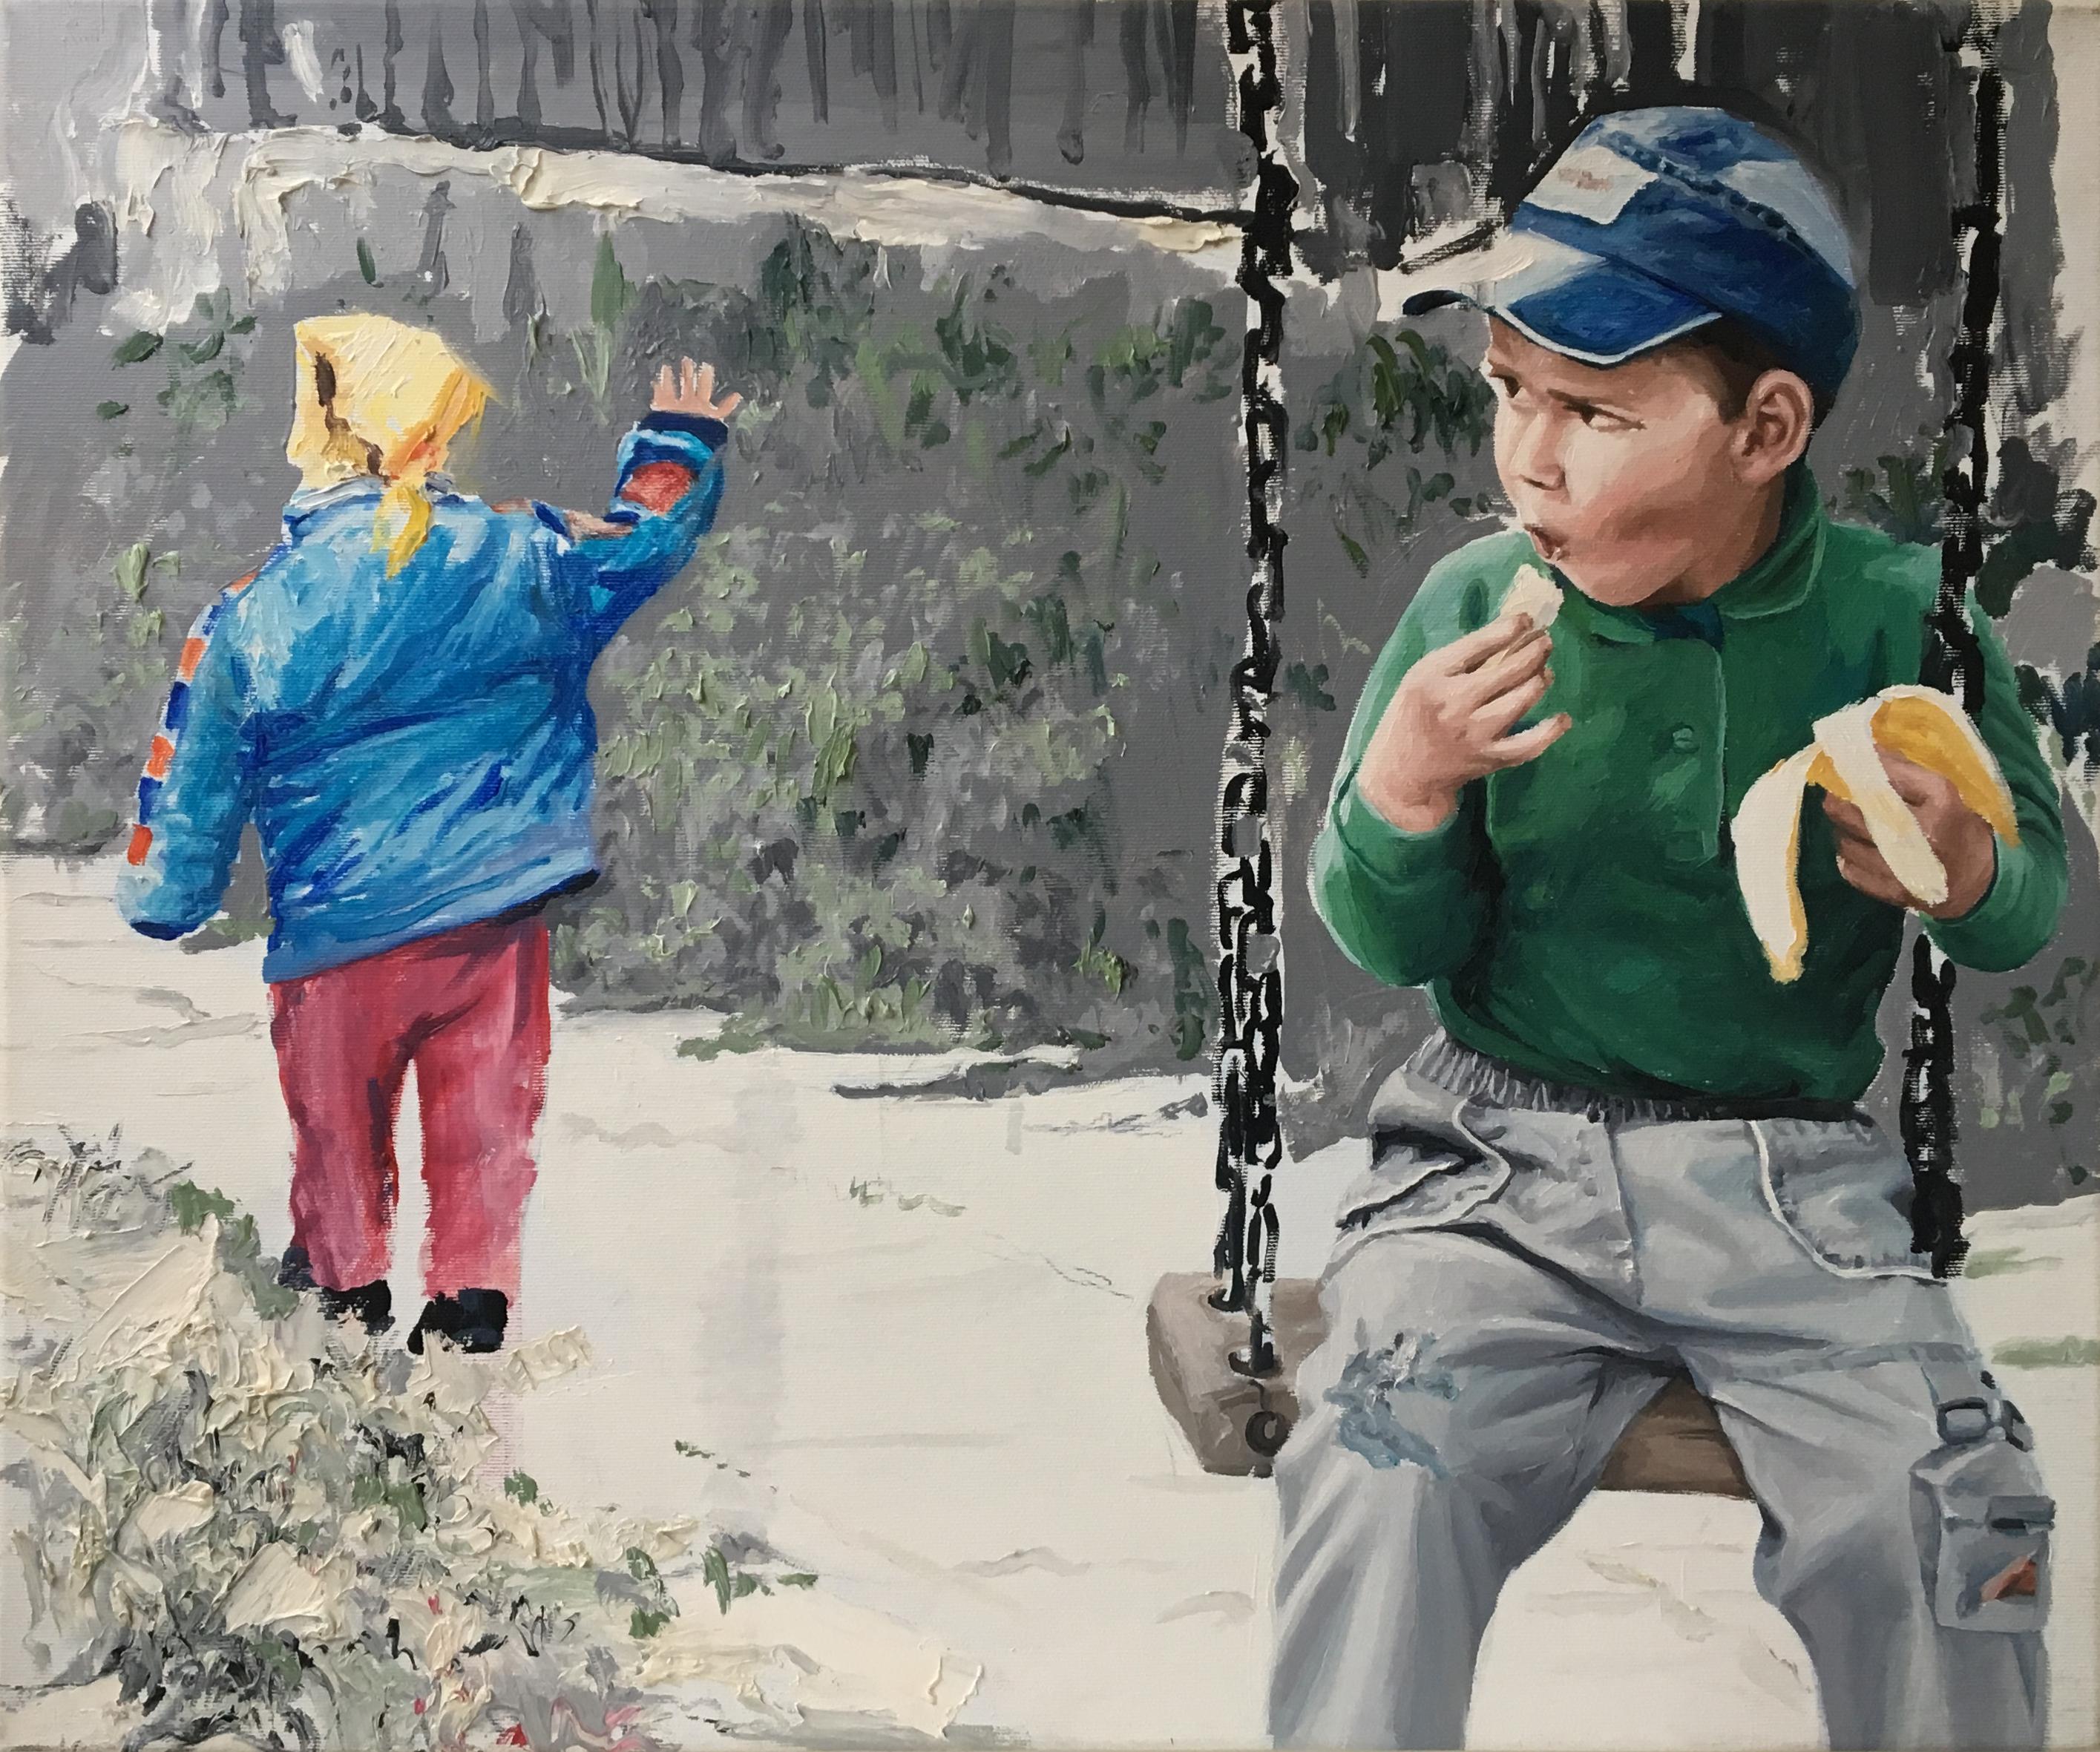 Staring - Contemporary, Figurative Art, Blue, Green, Yellow, Playground, Kids